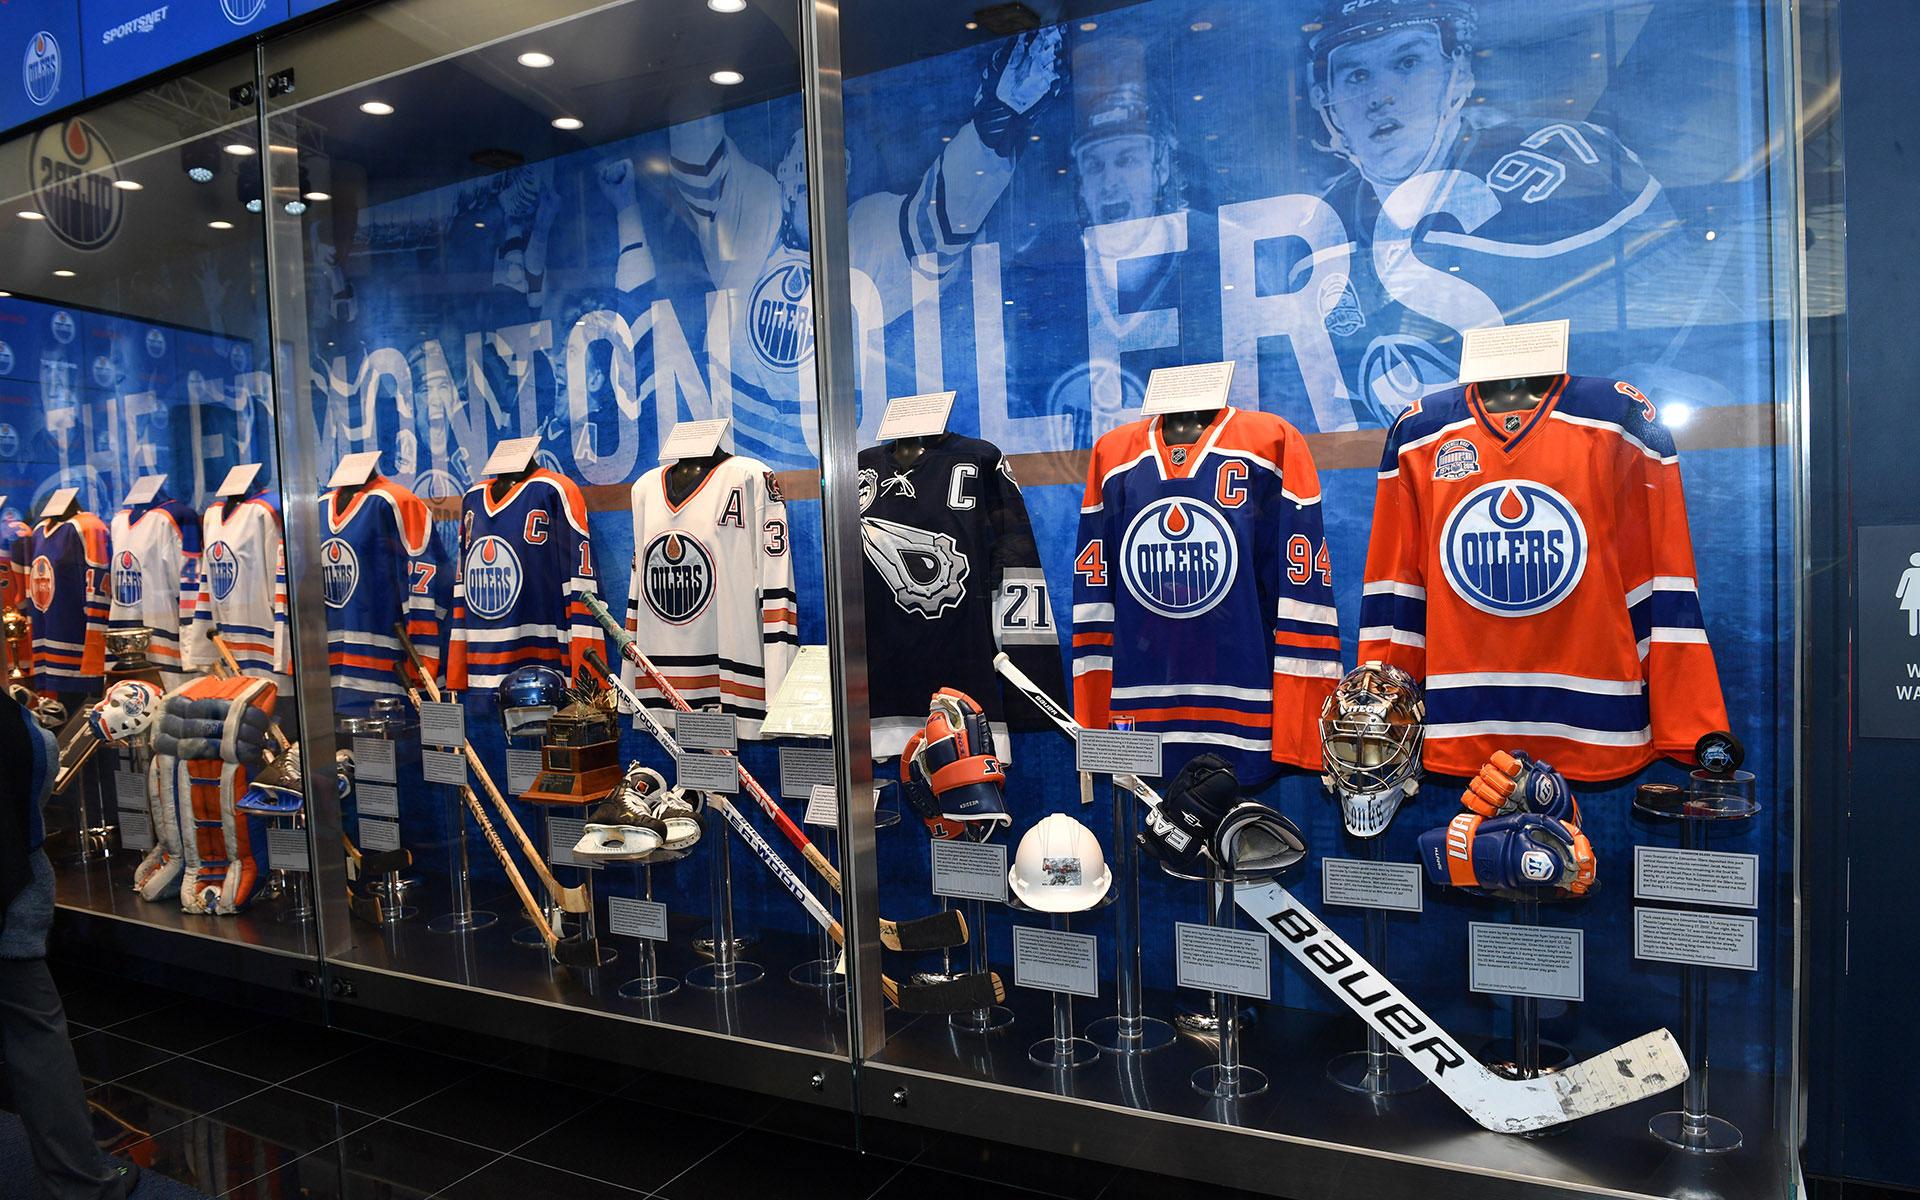 Oilers Hall of Fame